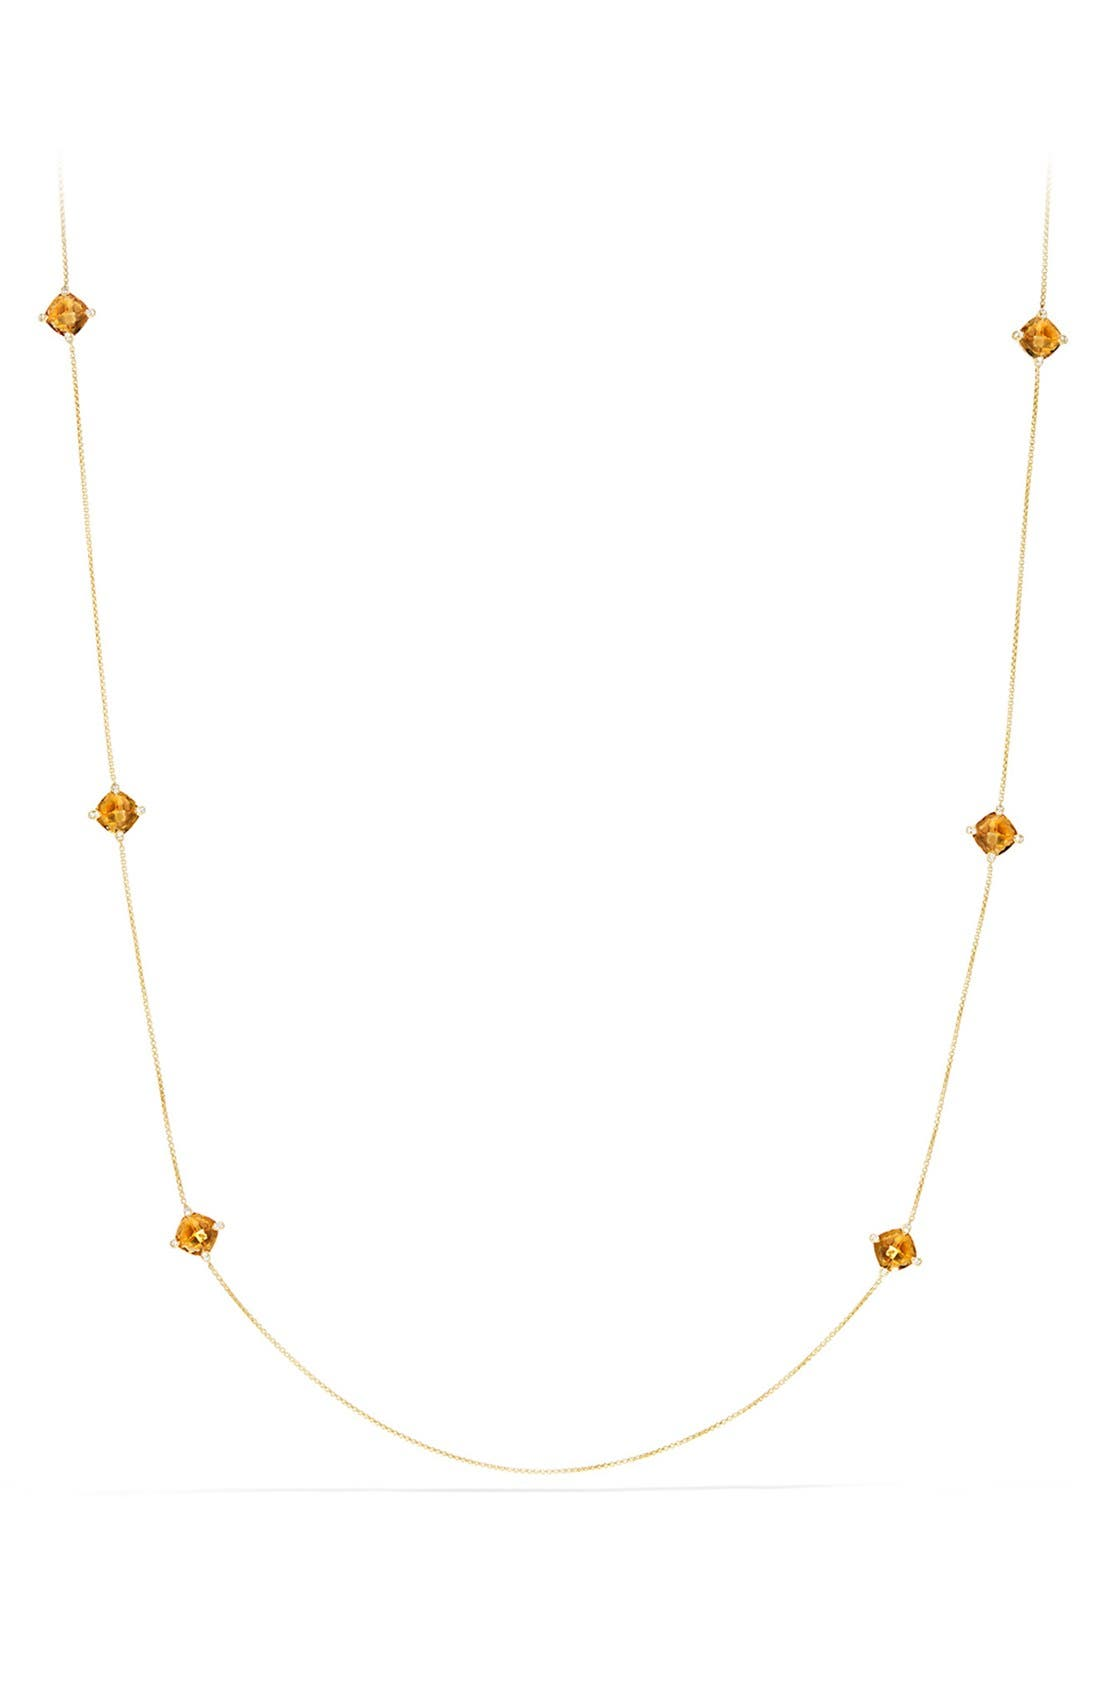 Main Image - David Yurman 'Châtelaine' Long Semiprecious Stone Necklace with Diamonds